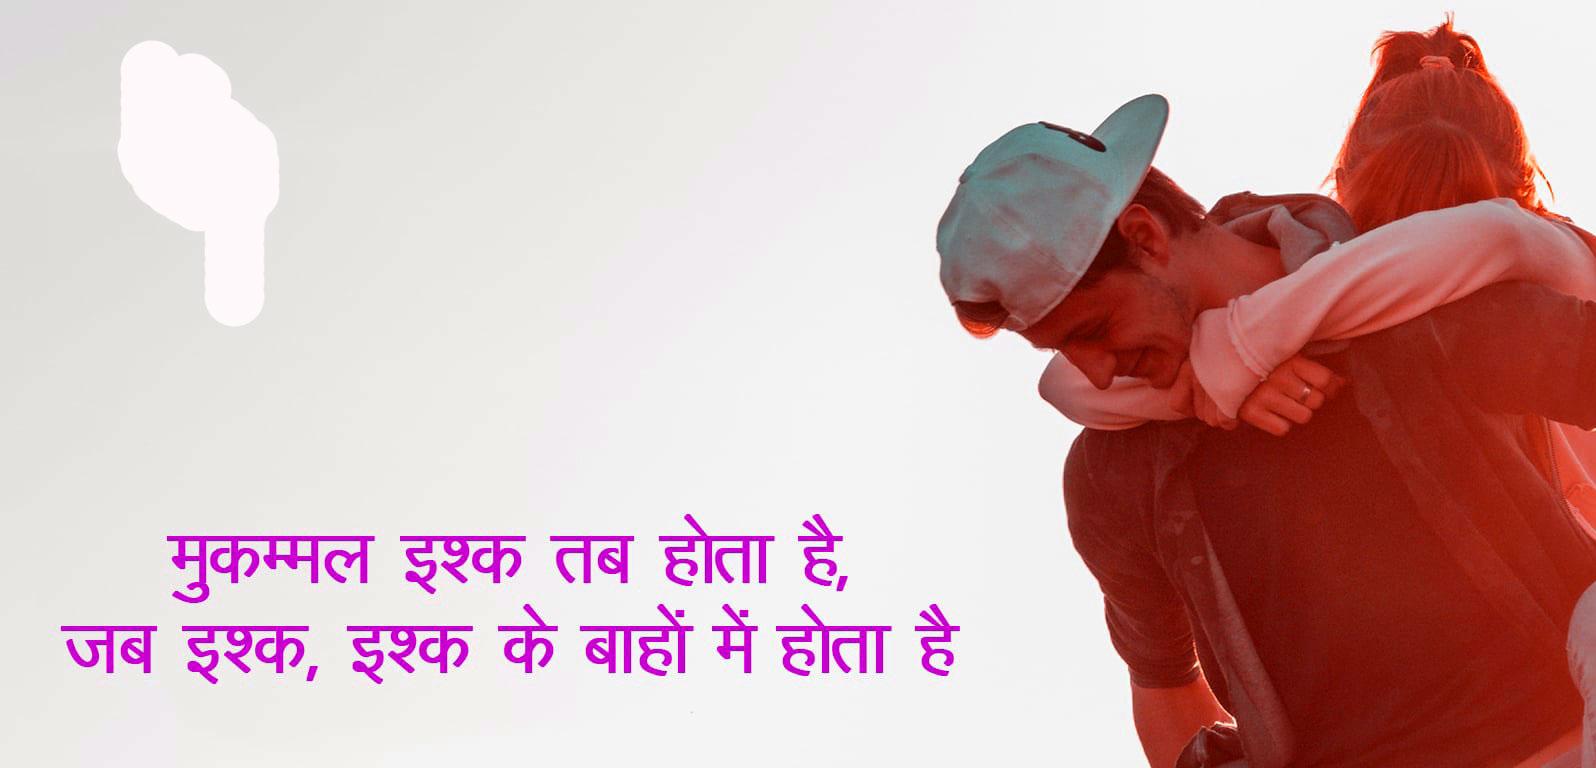 Hindi Love Couple Whatsapp Dp 6